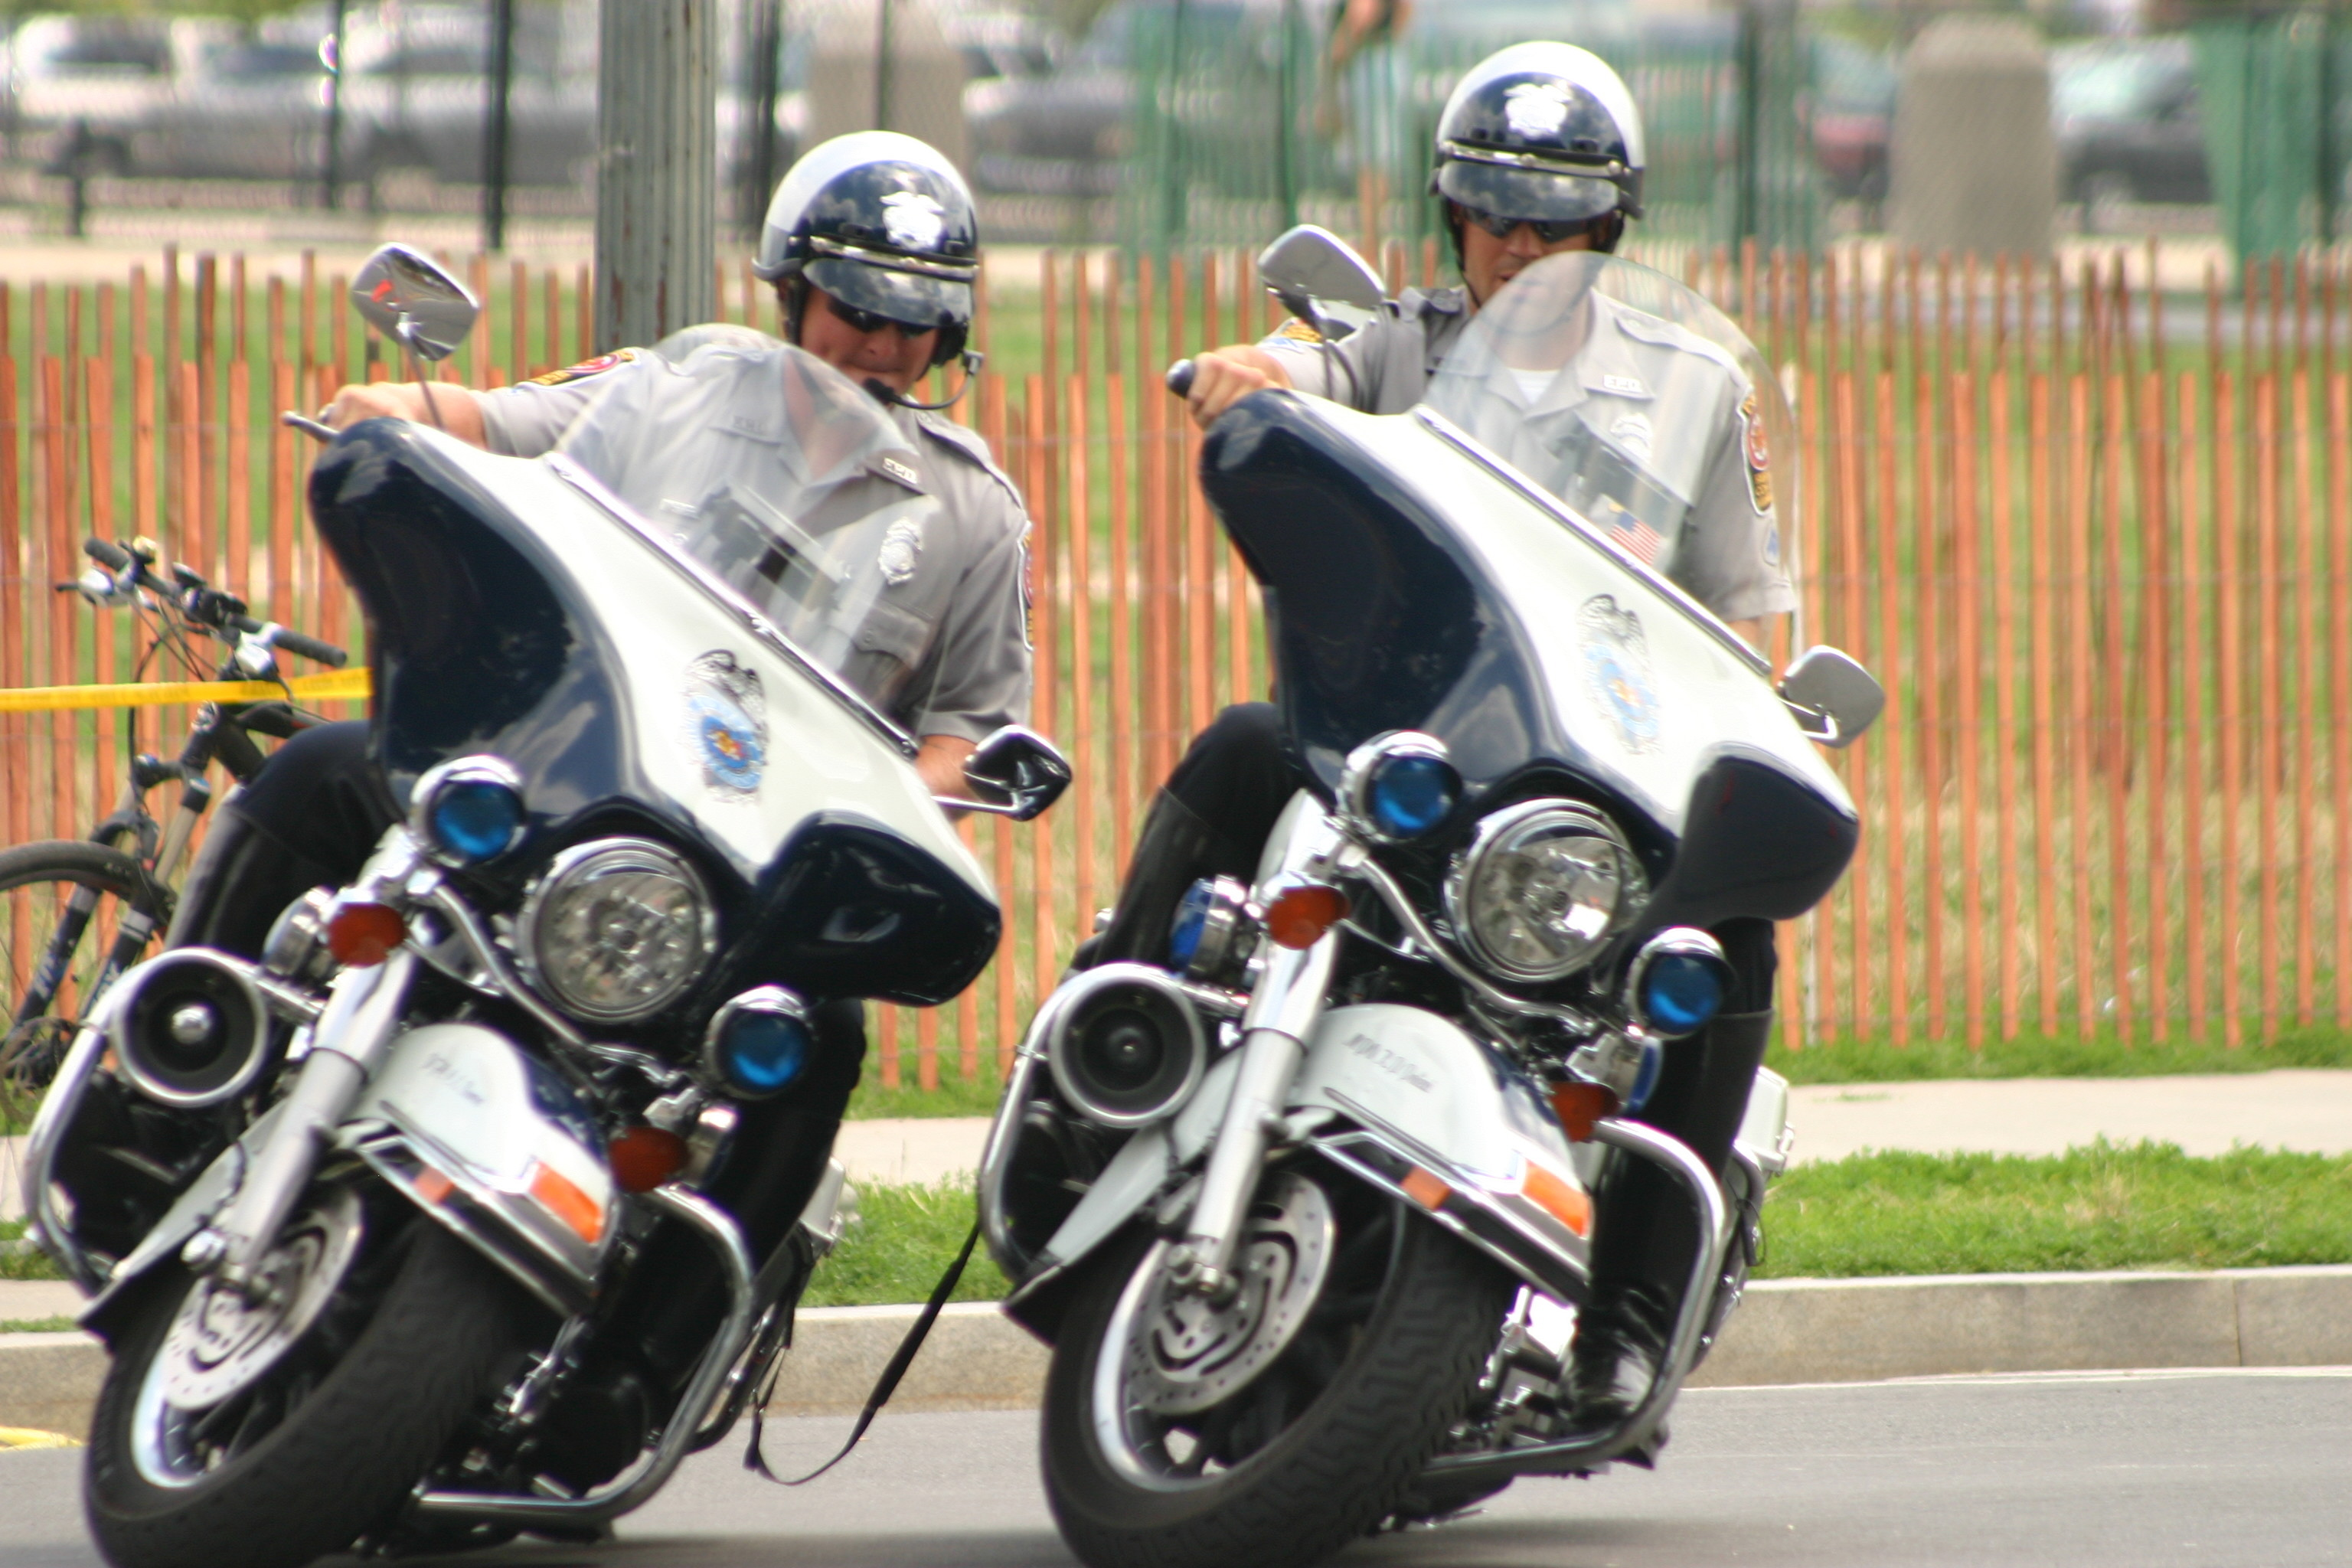 Ducati Motorcycle Theft In Chelsea London